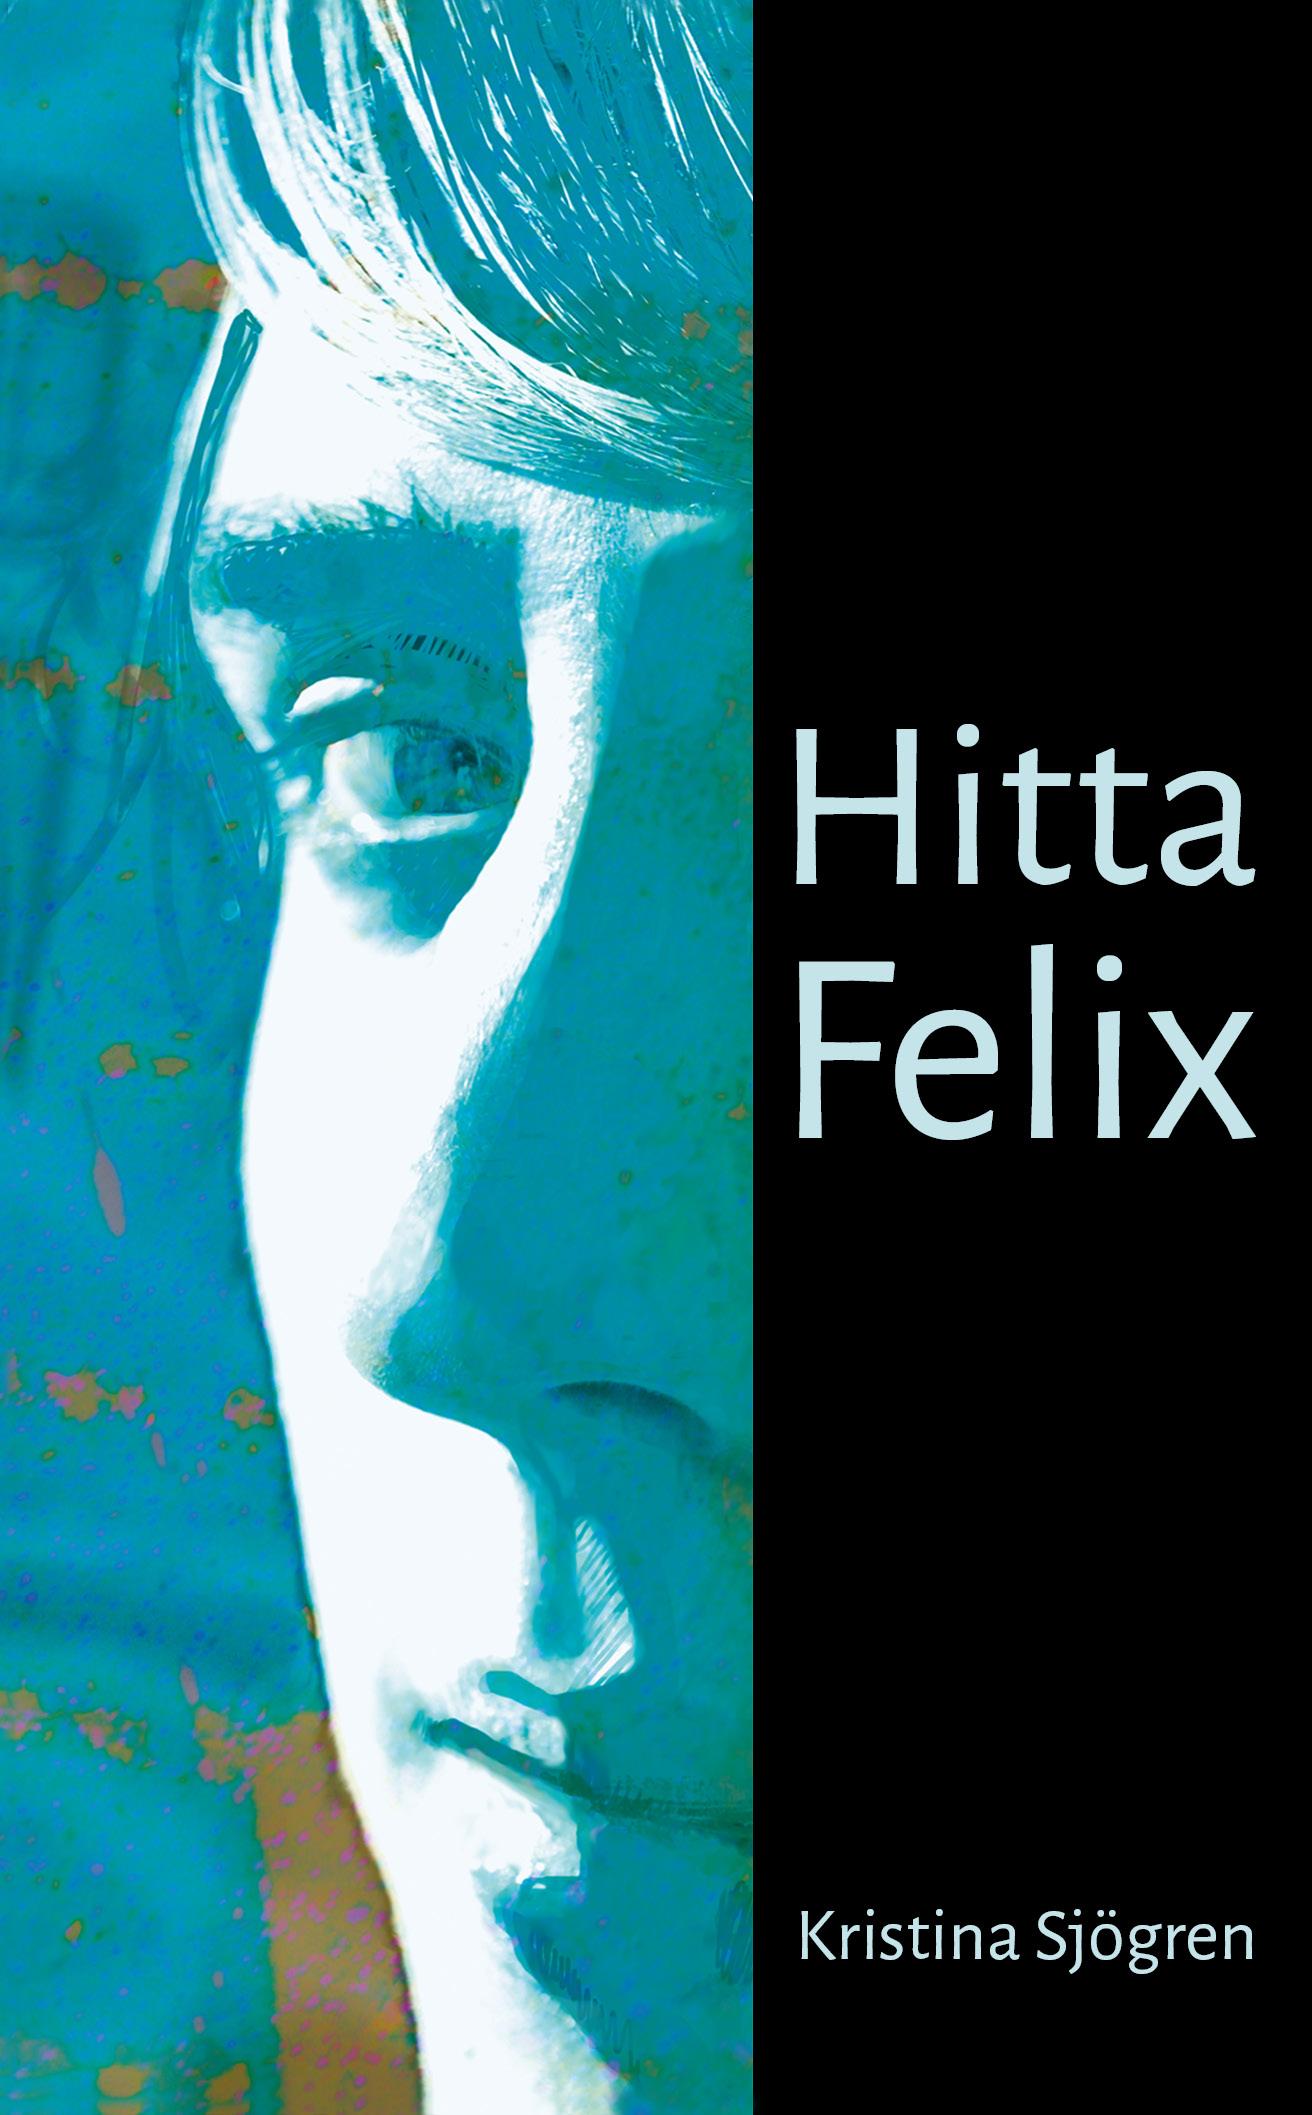 Hitta Felix av Kristina Sjögren